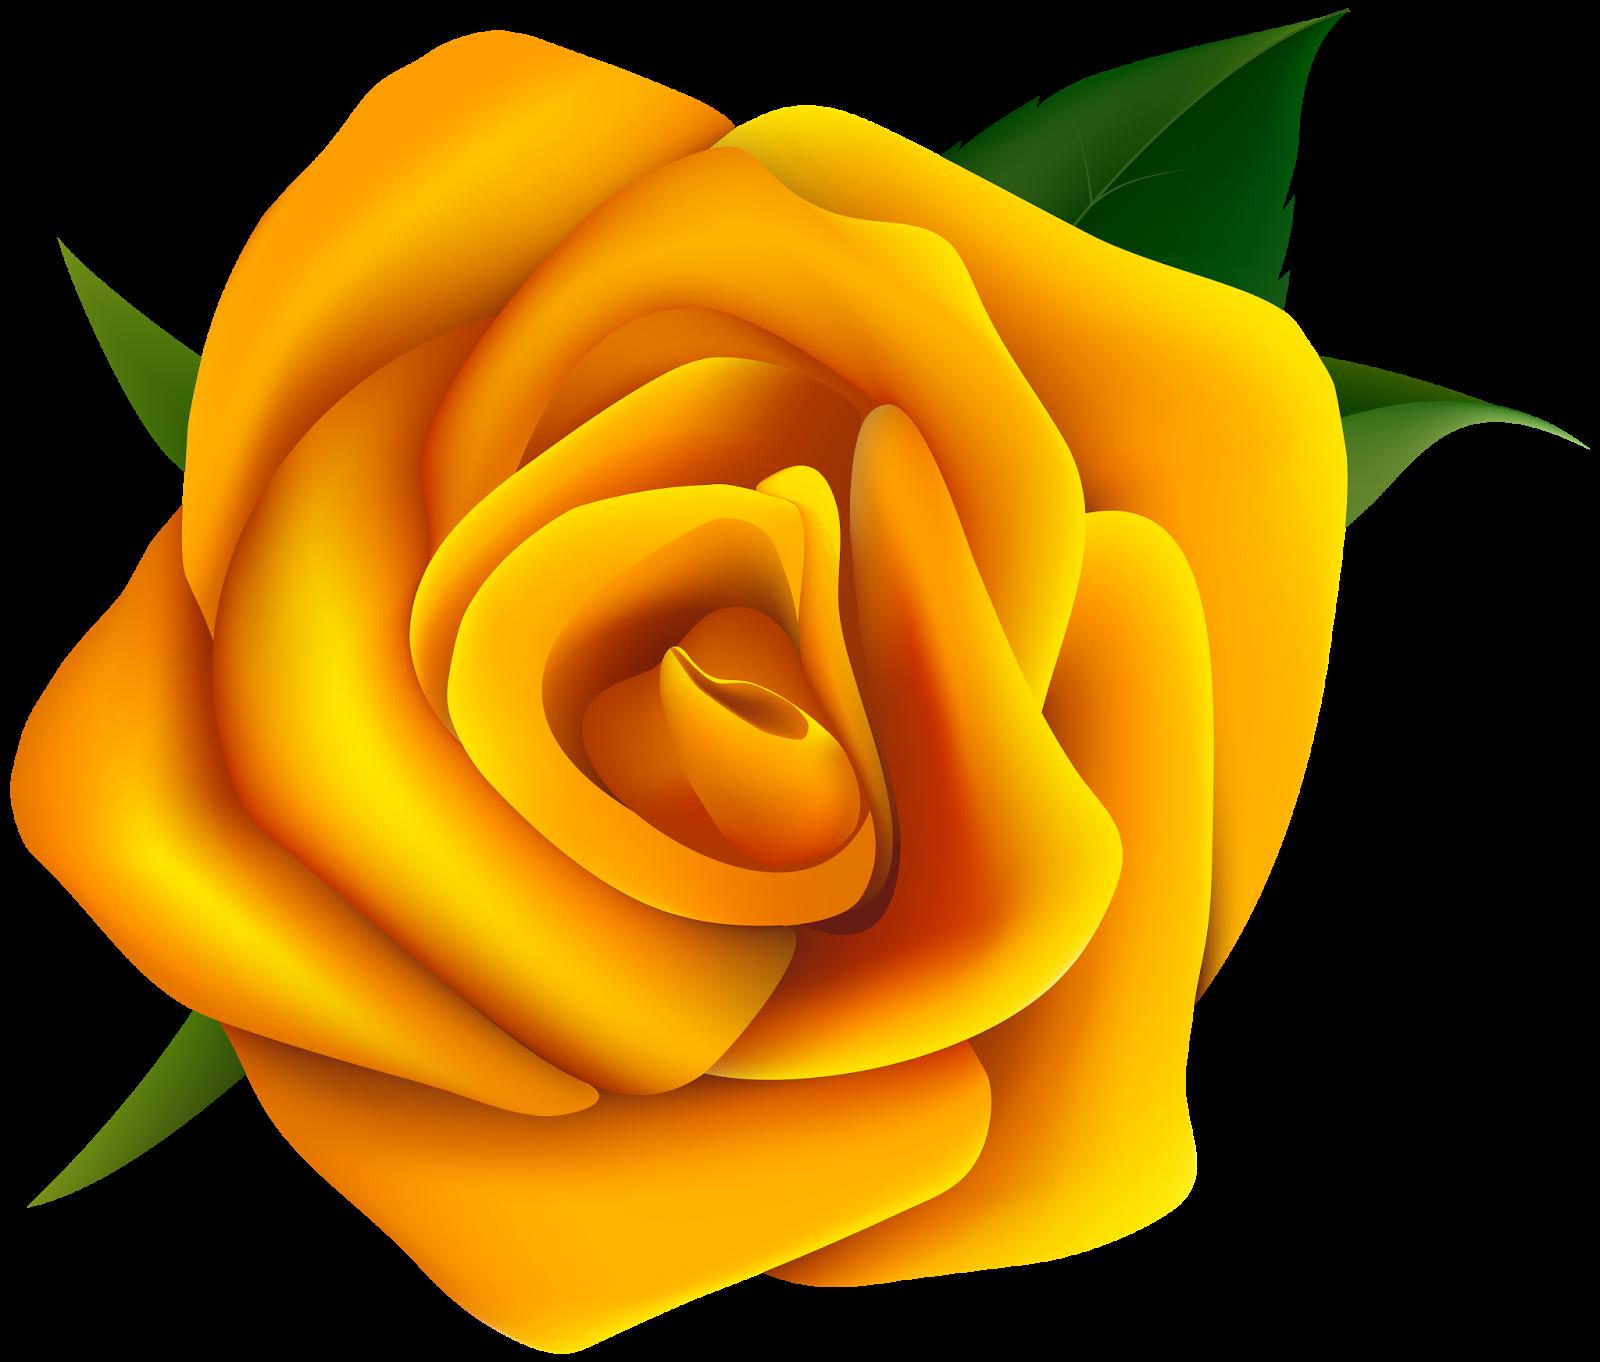 Pin de eriza em flori desenate Clipart de flores